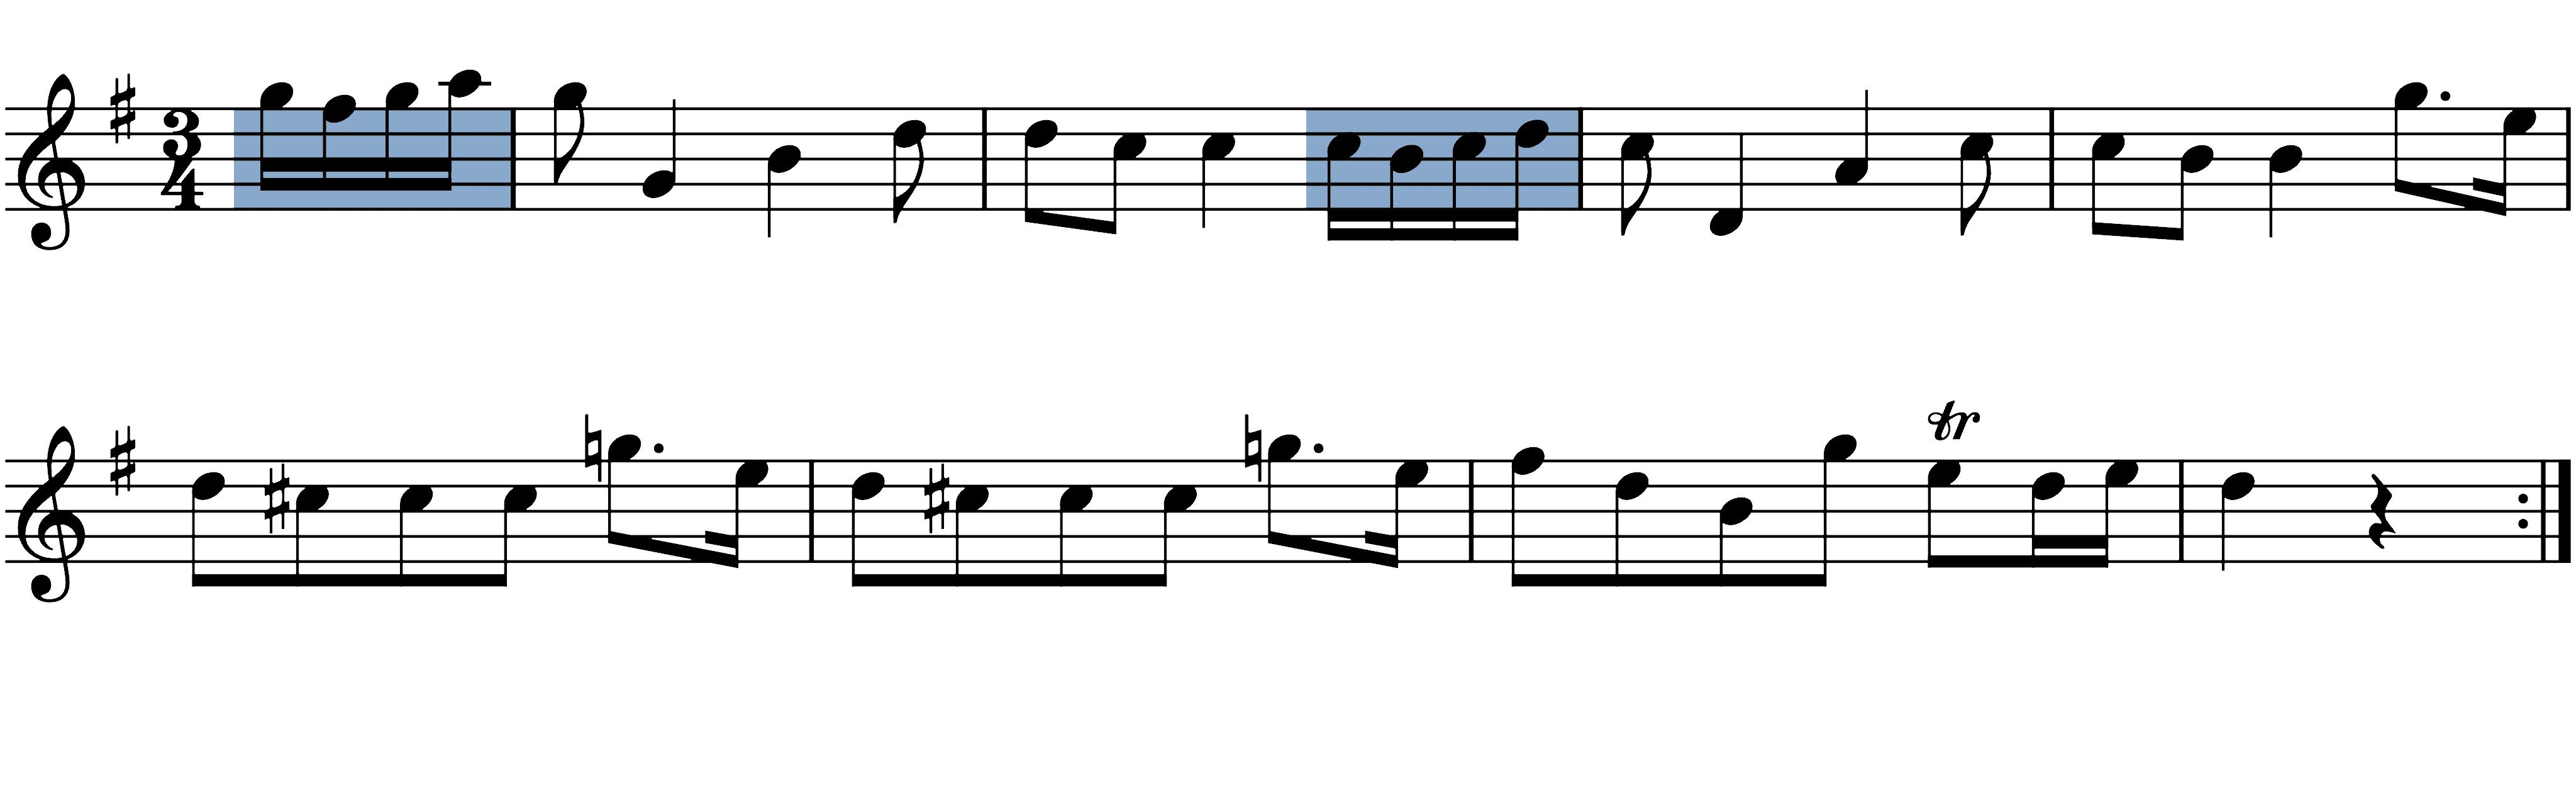 boccherini-minuet melodic figures